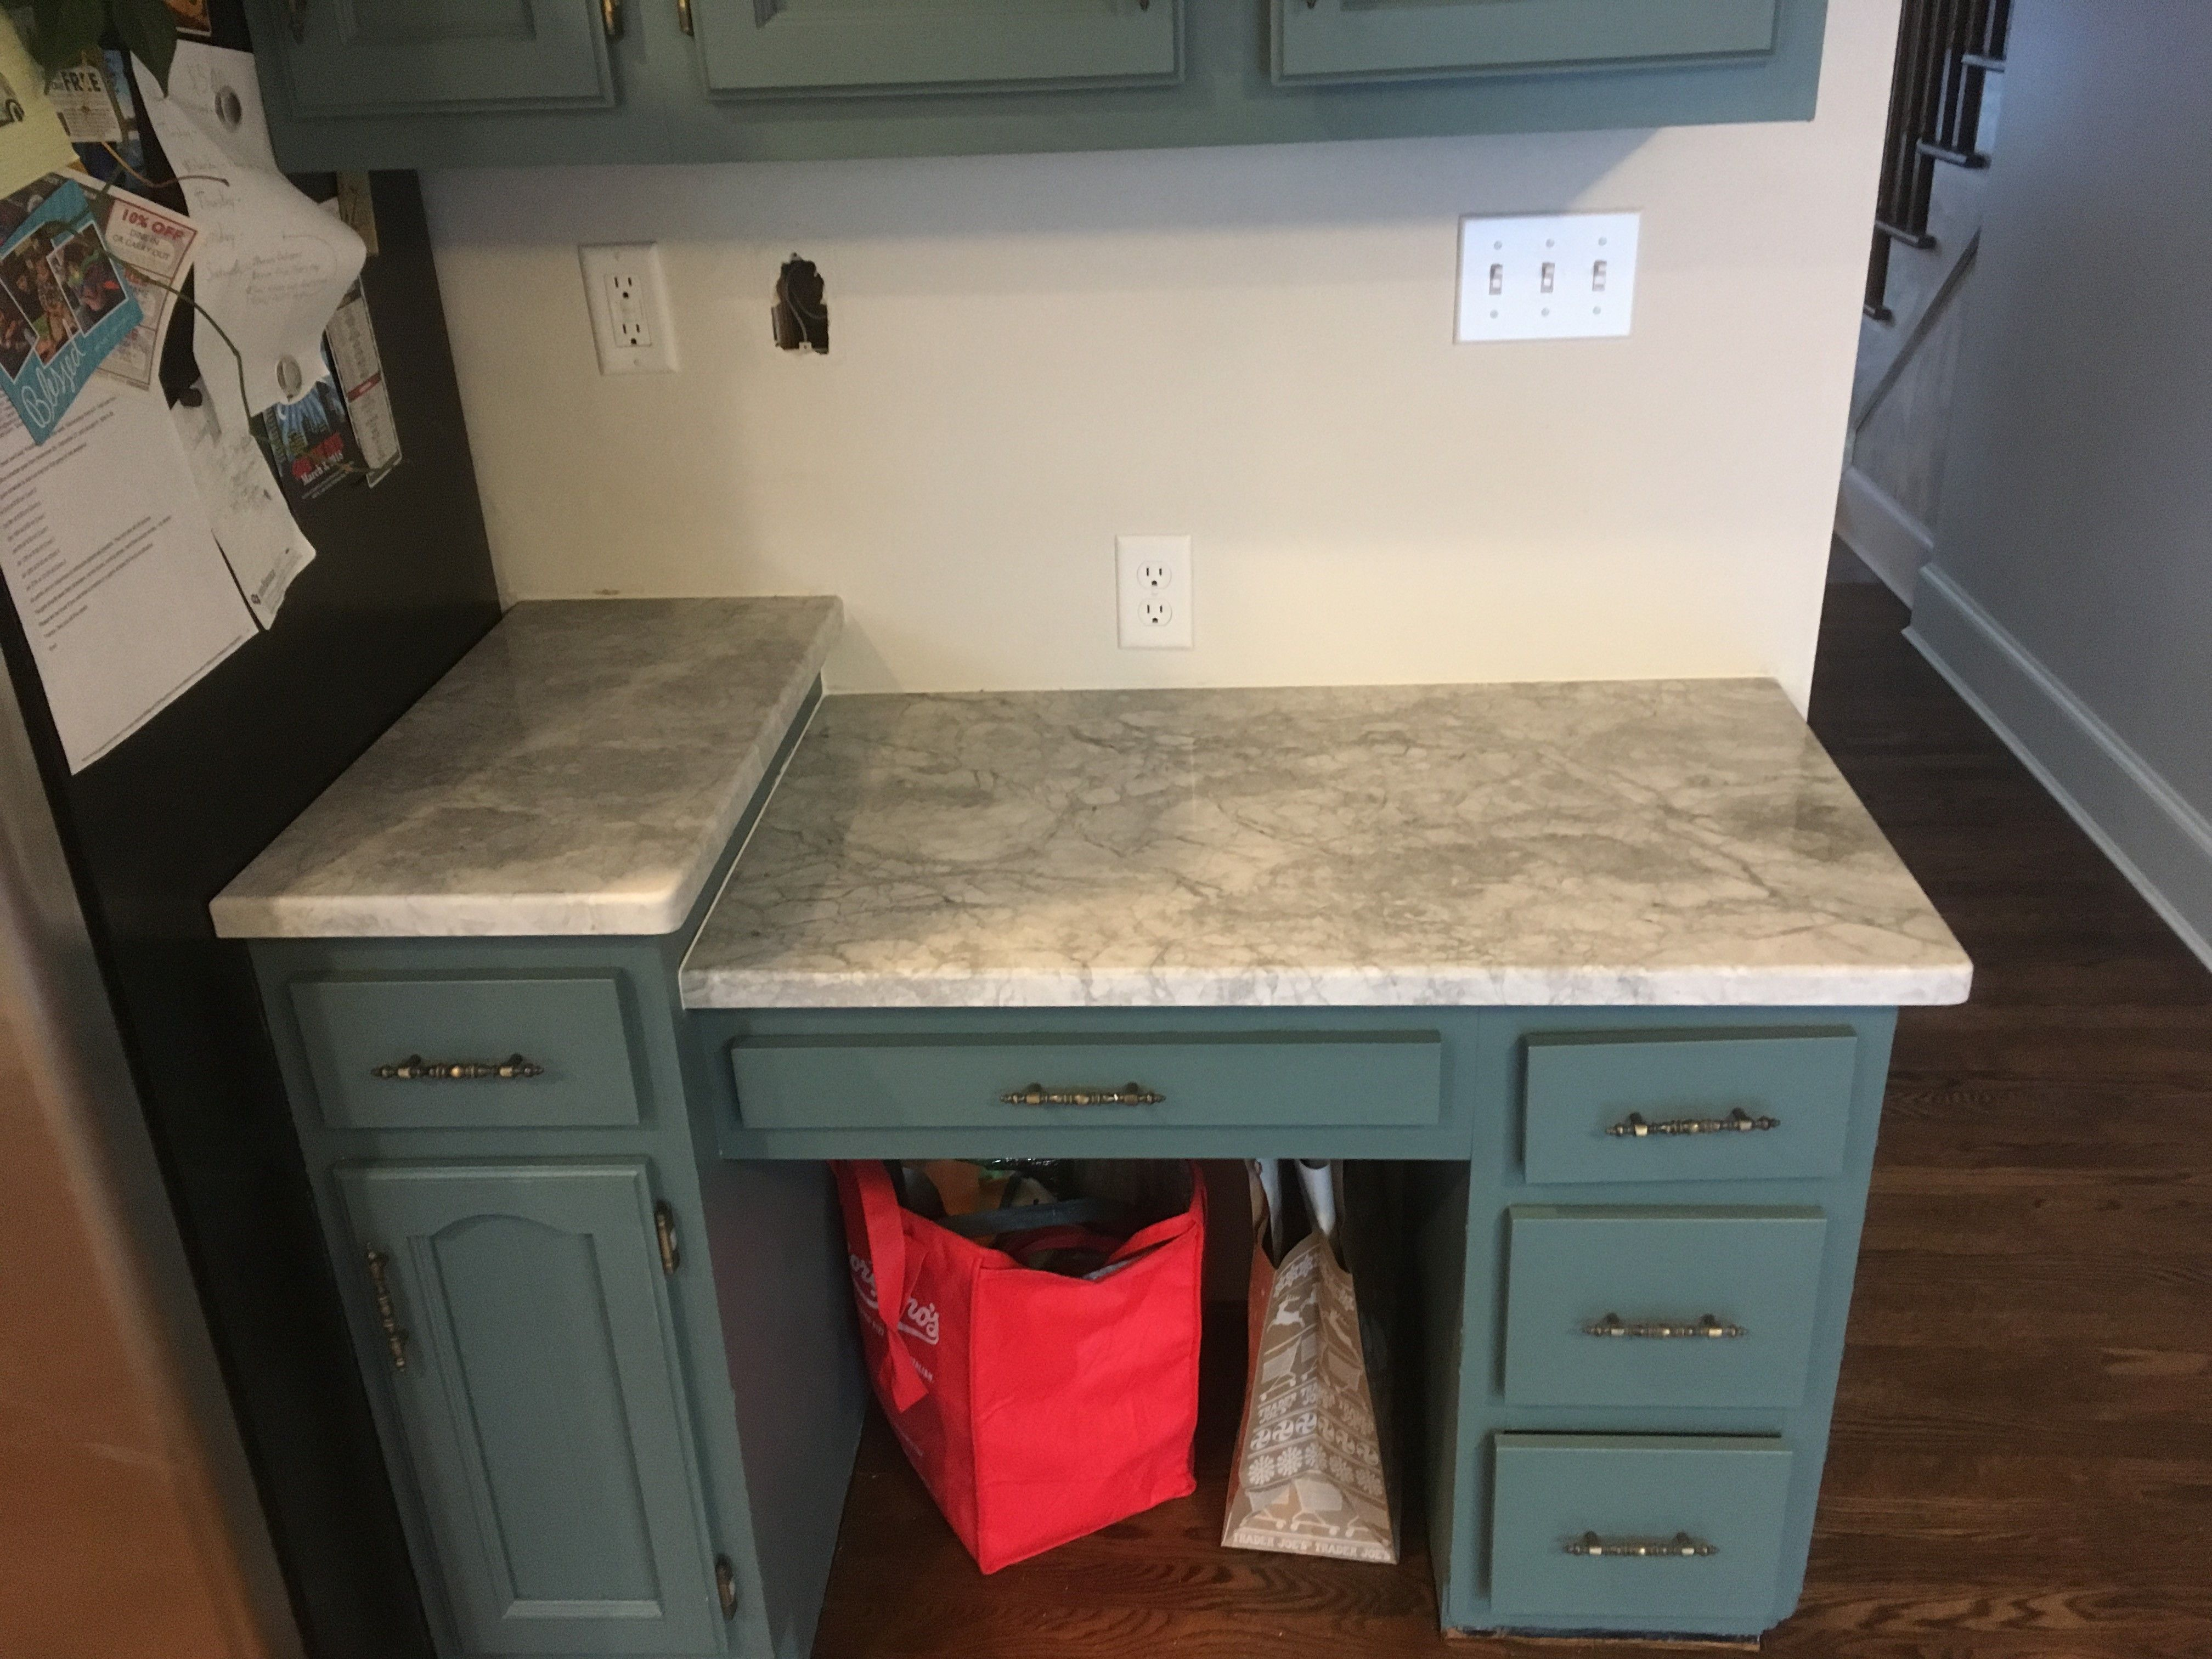 In-progress shots of Honed Super White slab from Terrazzo & Marble Supply Companies #remodel #kitchen #quartzite #update #honed #superwhitequartzite